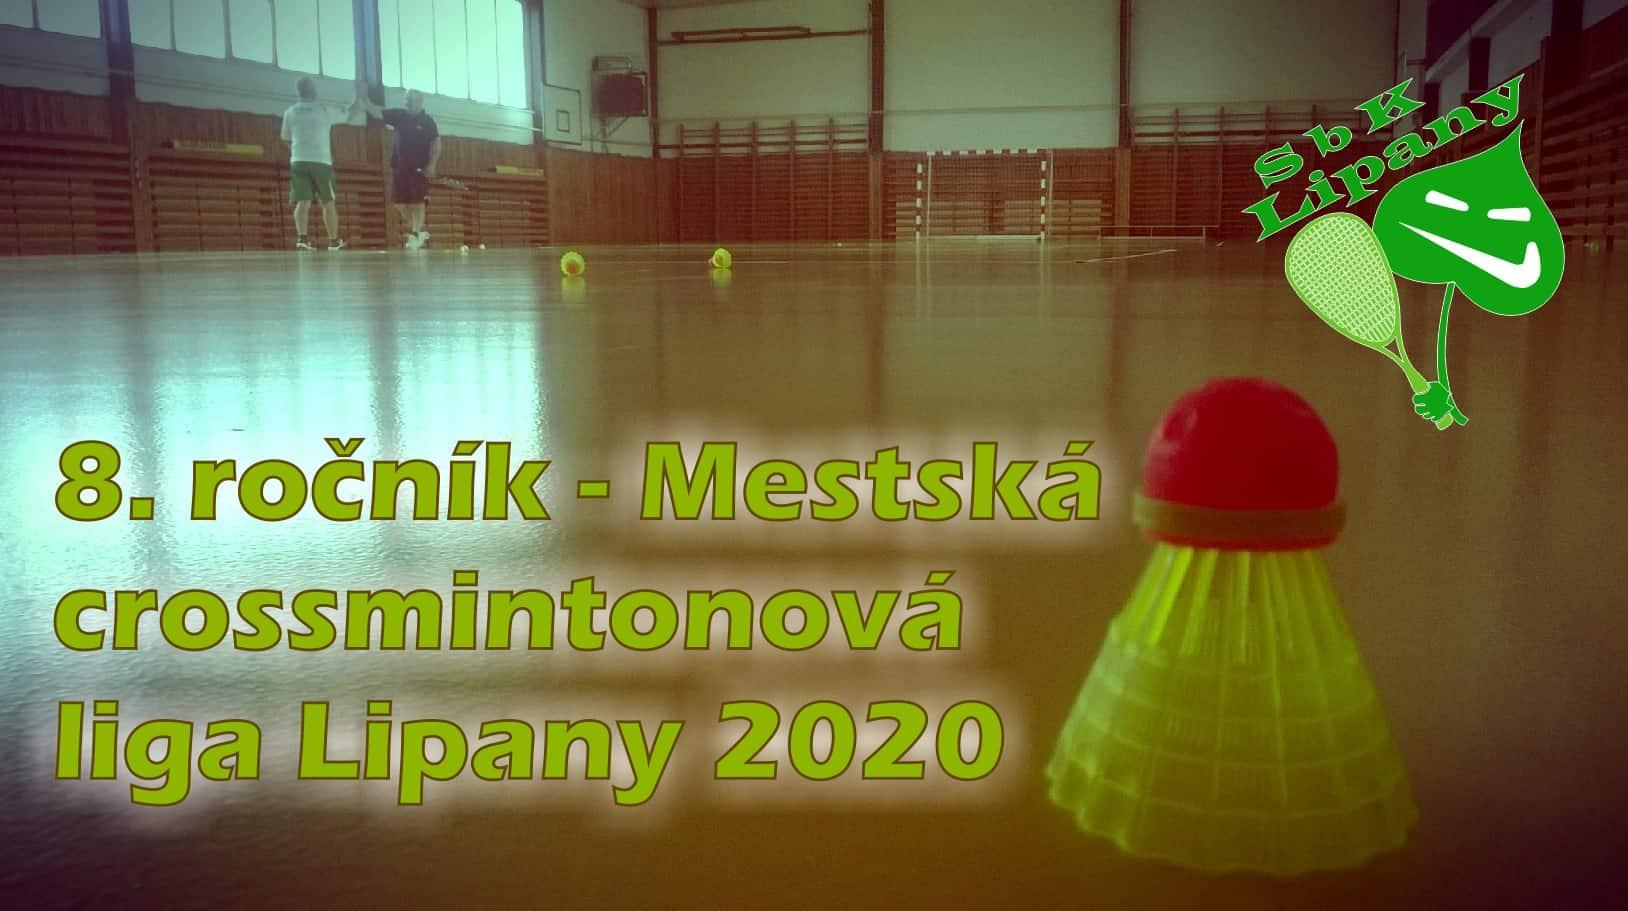 8. ročník – Mestská crossmintonová liga Lipany 2020 - LIGA JE ZRUŠENÁ